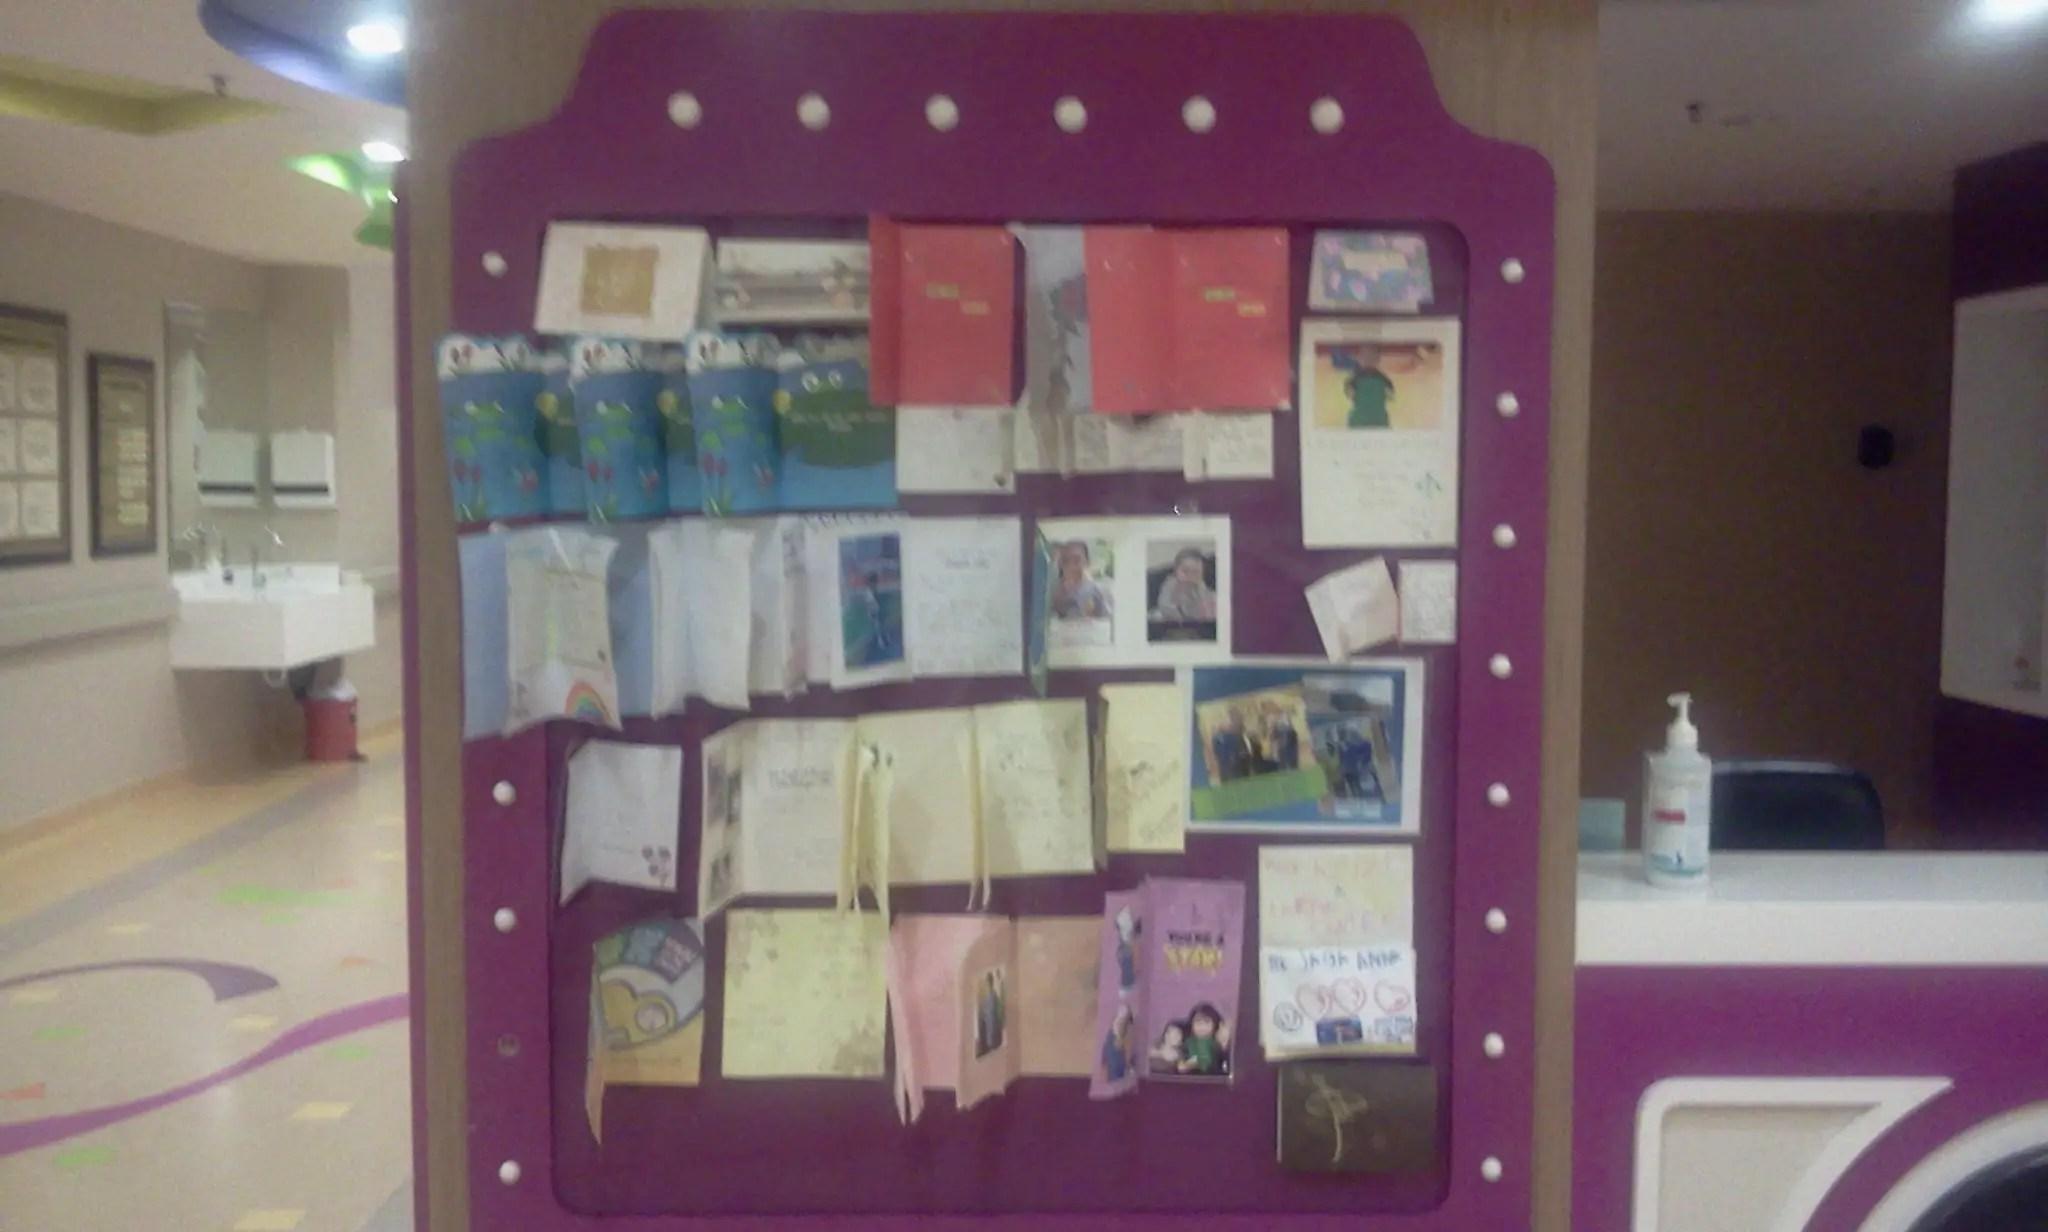 Wad paediatric qaseh terbaik syukur ada medical card for Mural untuk kanak kanak